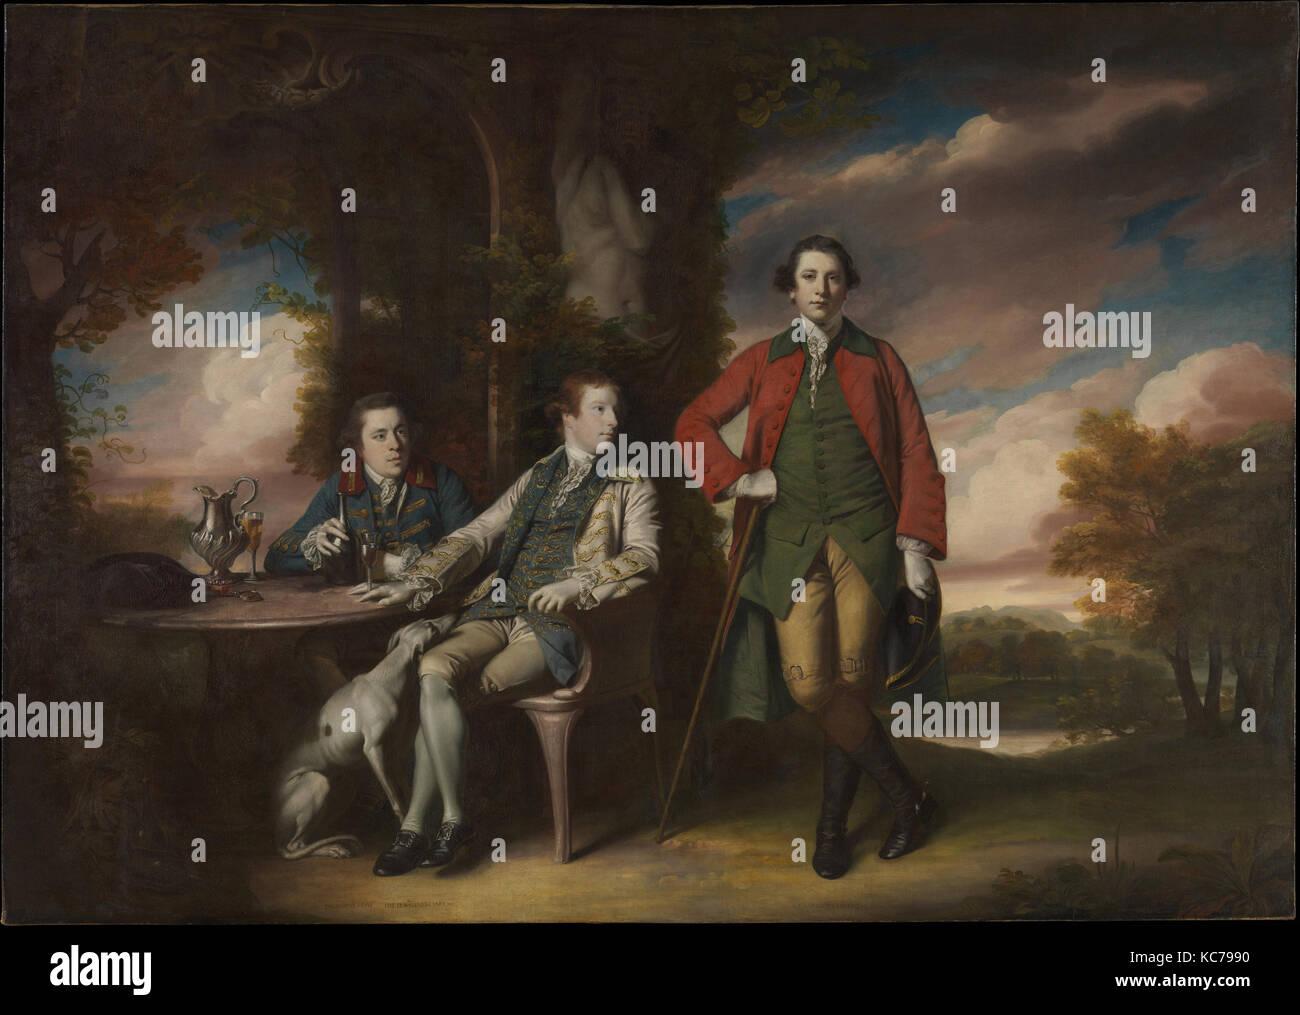 L'honorable Henry Fane (1739-1802) avec Inigo Jones et Charles Blair, Sir Joshua Reynolds, 1761-66 Banque D'Images